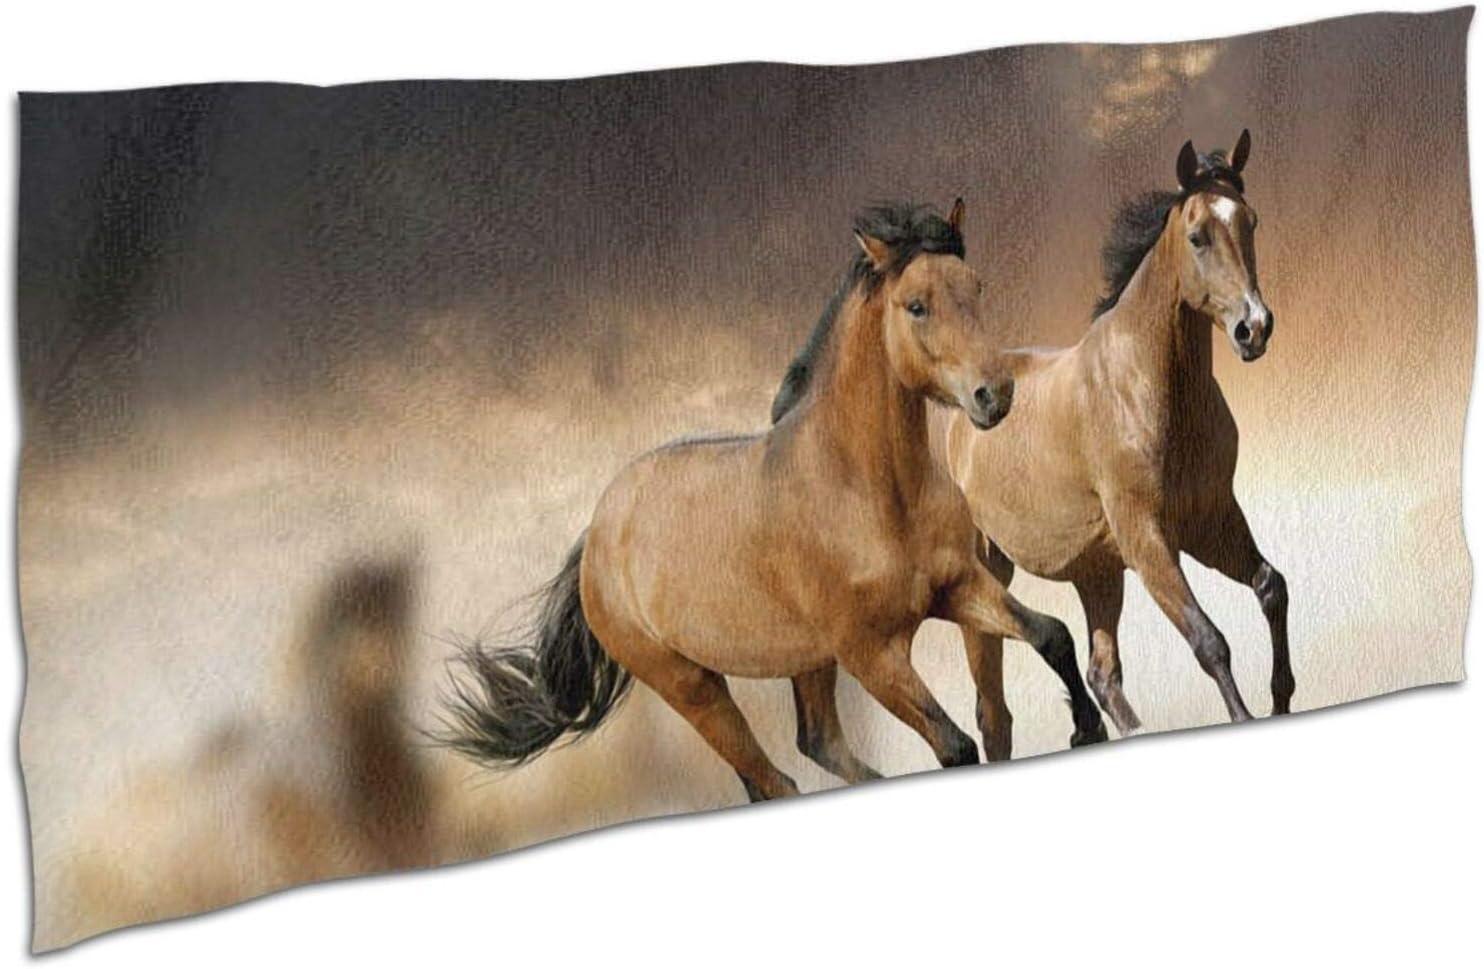 Trust Running Horse Bath Towel Max 64% OFF Microfiber Beach Soft Towels Skin-Frien